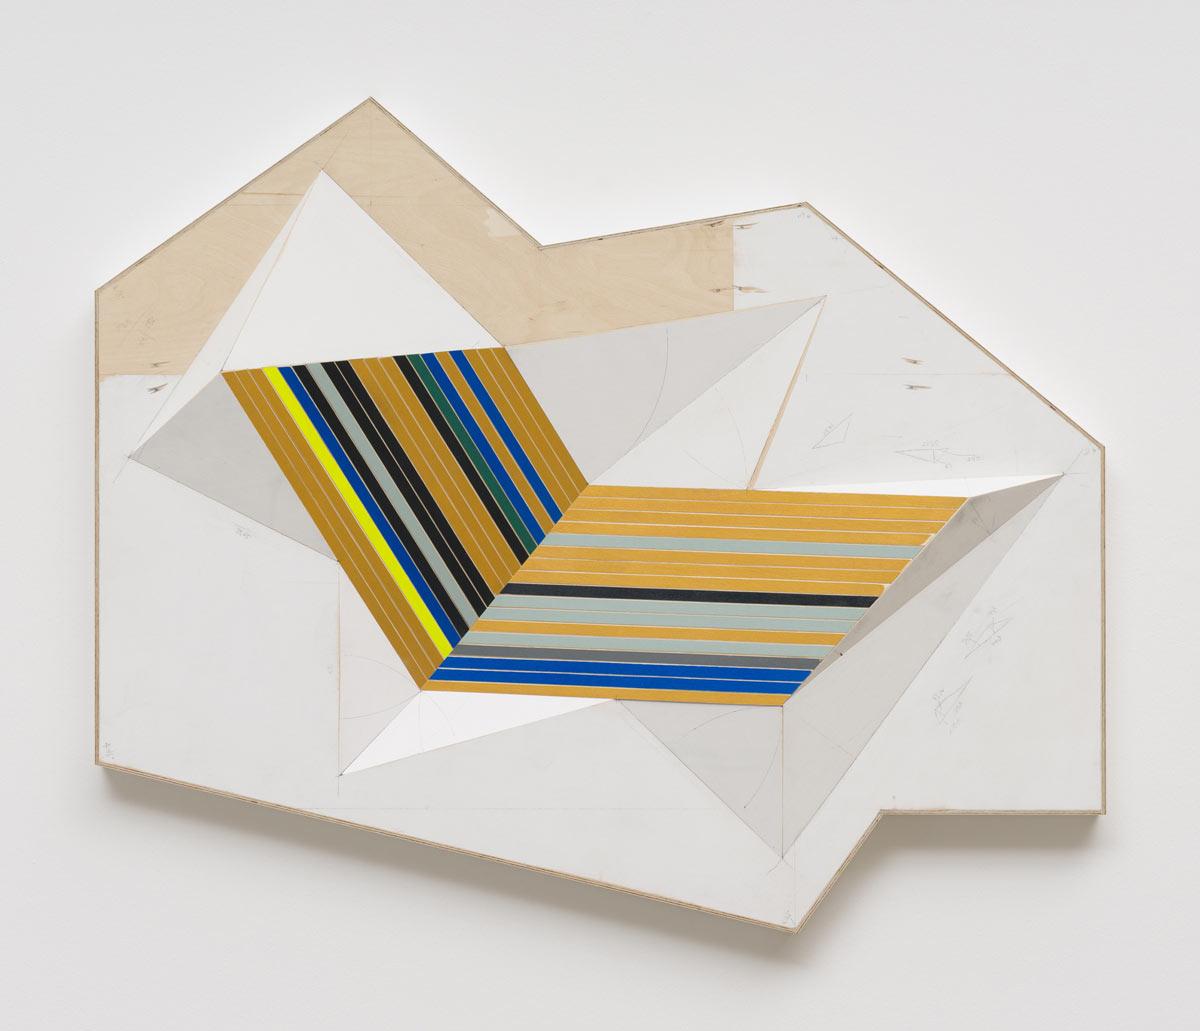 Jay Gard, Fuji, 2015, Sperrholz, Schrauben, Leim, Acryl, 93 × 127 × 12 cm, Sexauer Gallery